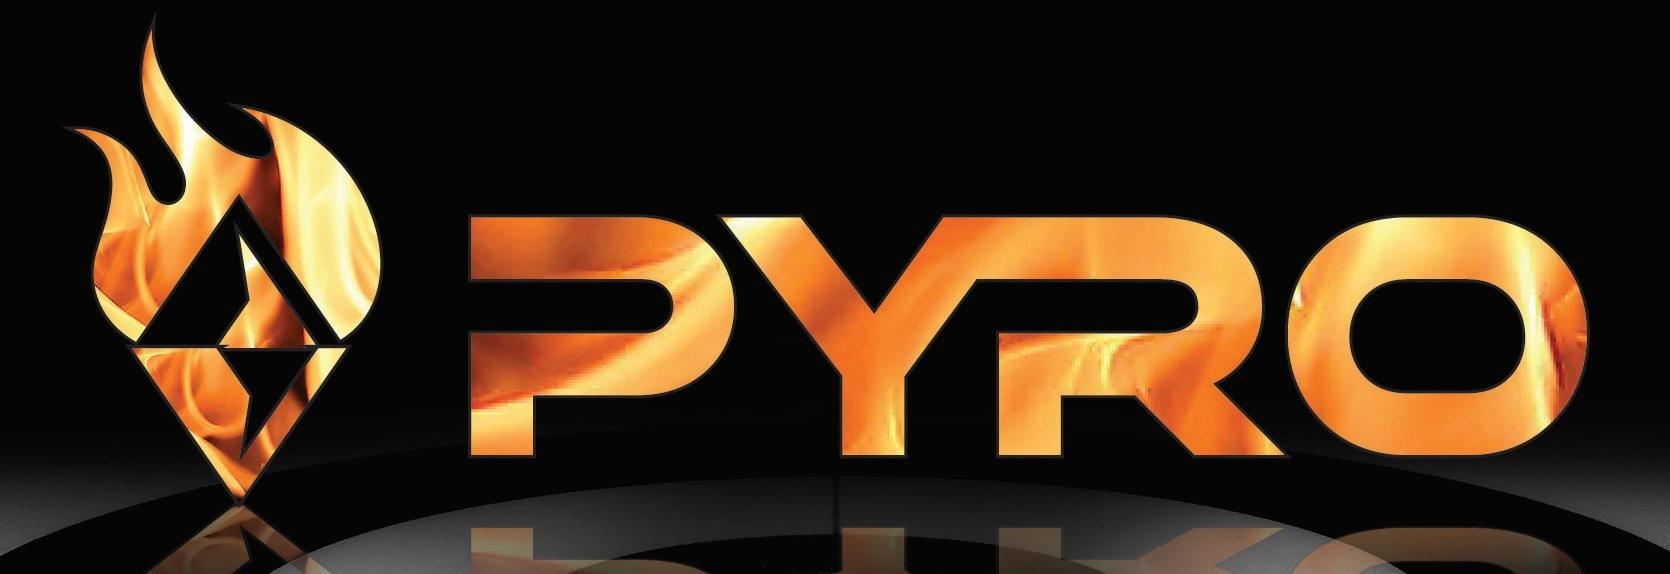 pyro-banner.jpg